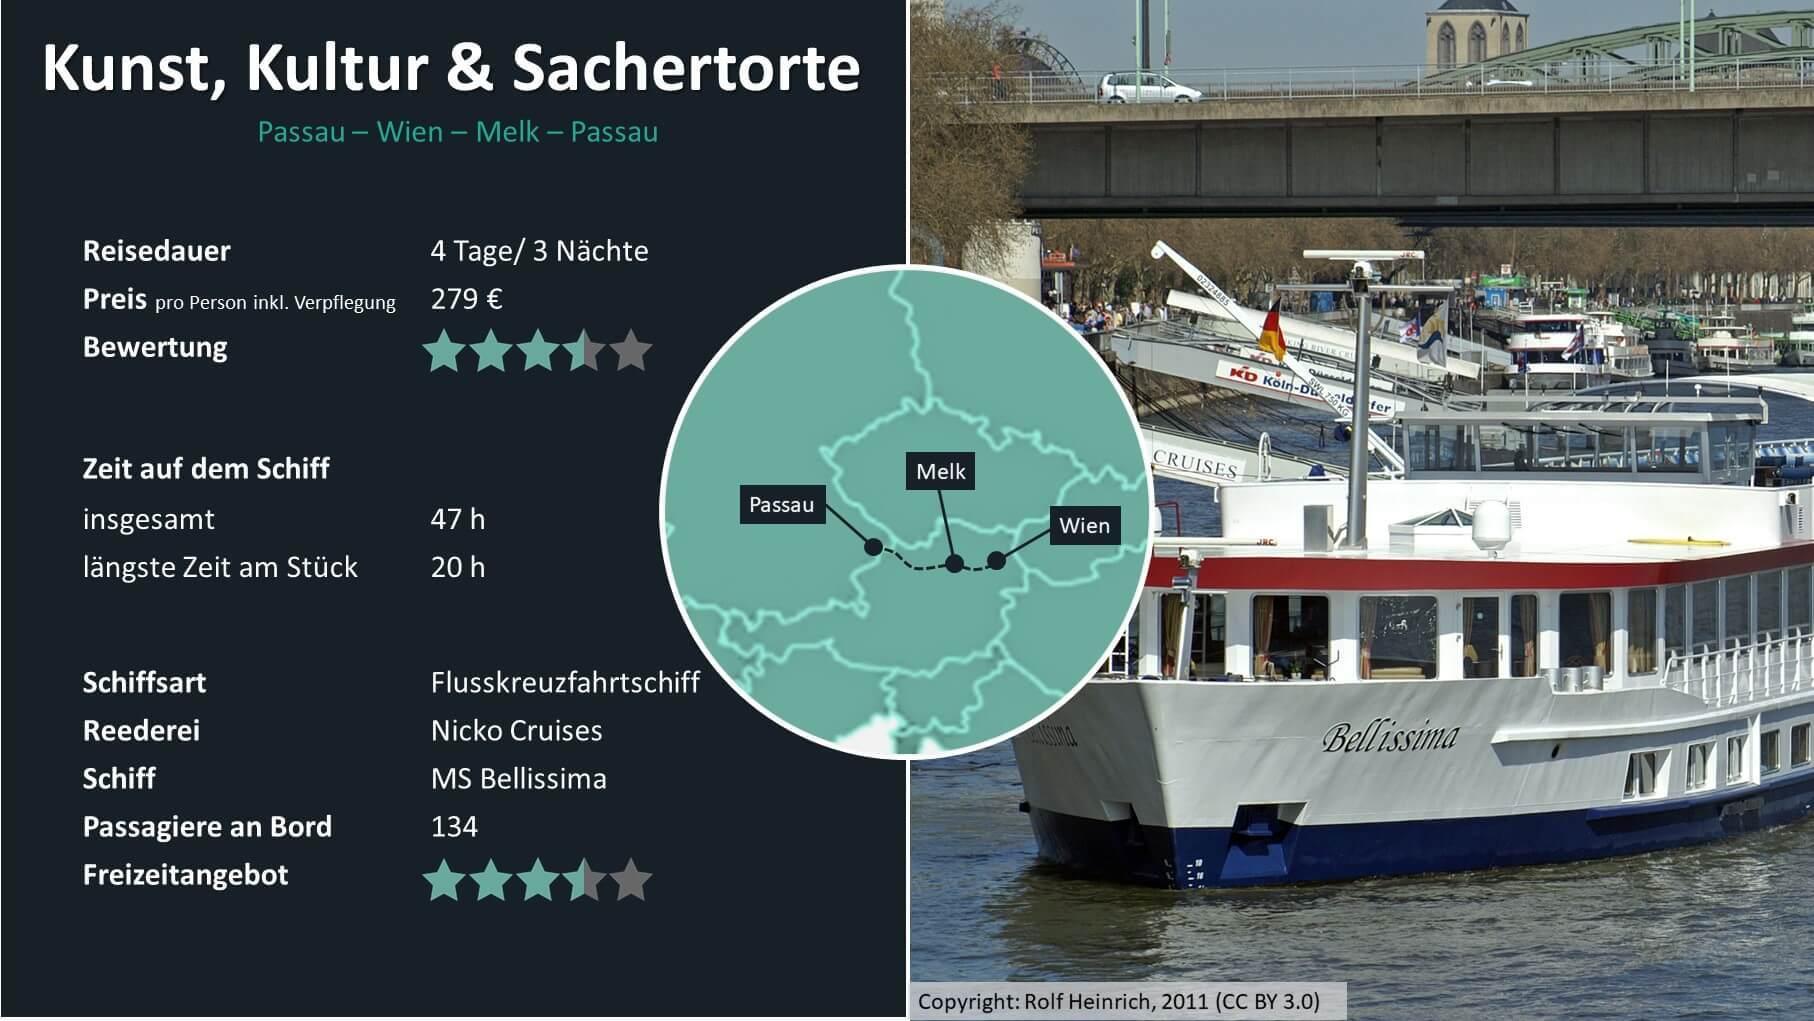 Minikreuzfahrt Flusskreuzfahrt Wien